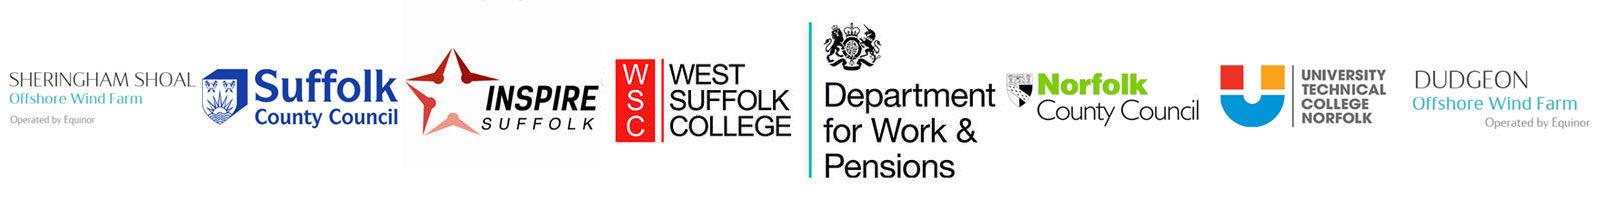 Site Image (Logos: SCC, Inspire Suffolk, West Suffolk College, DWP, NCC, UTCN)